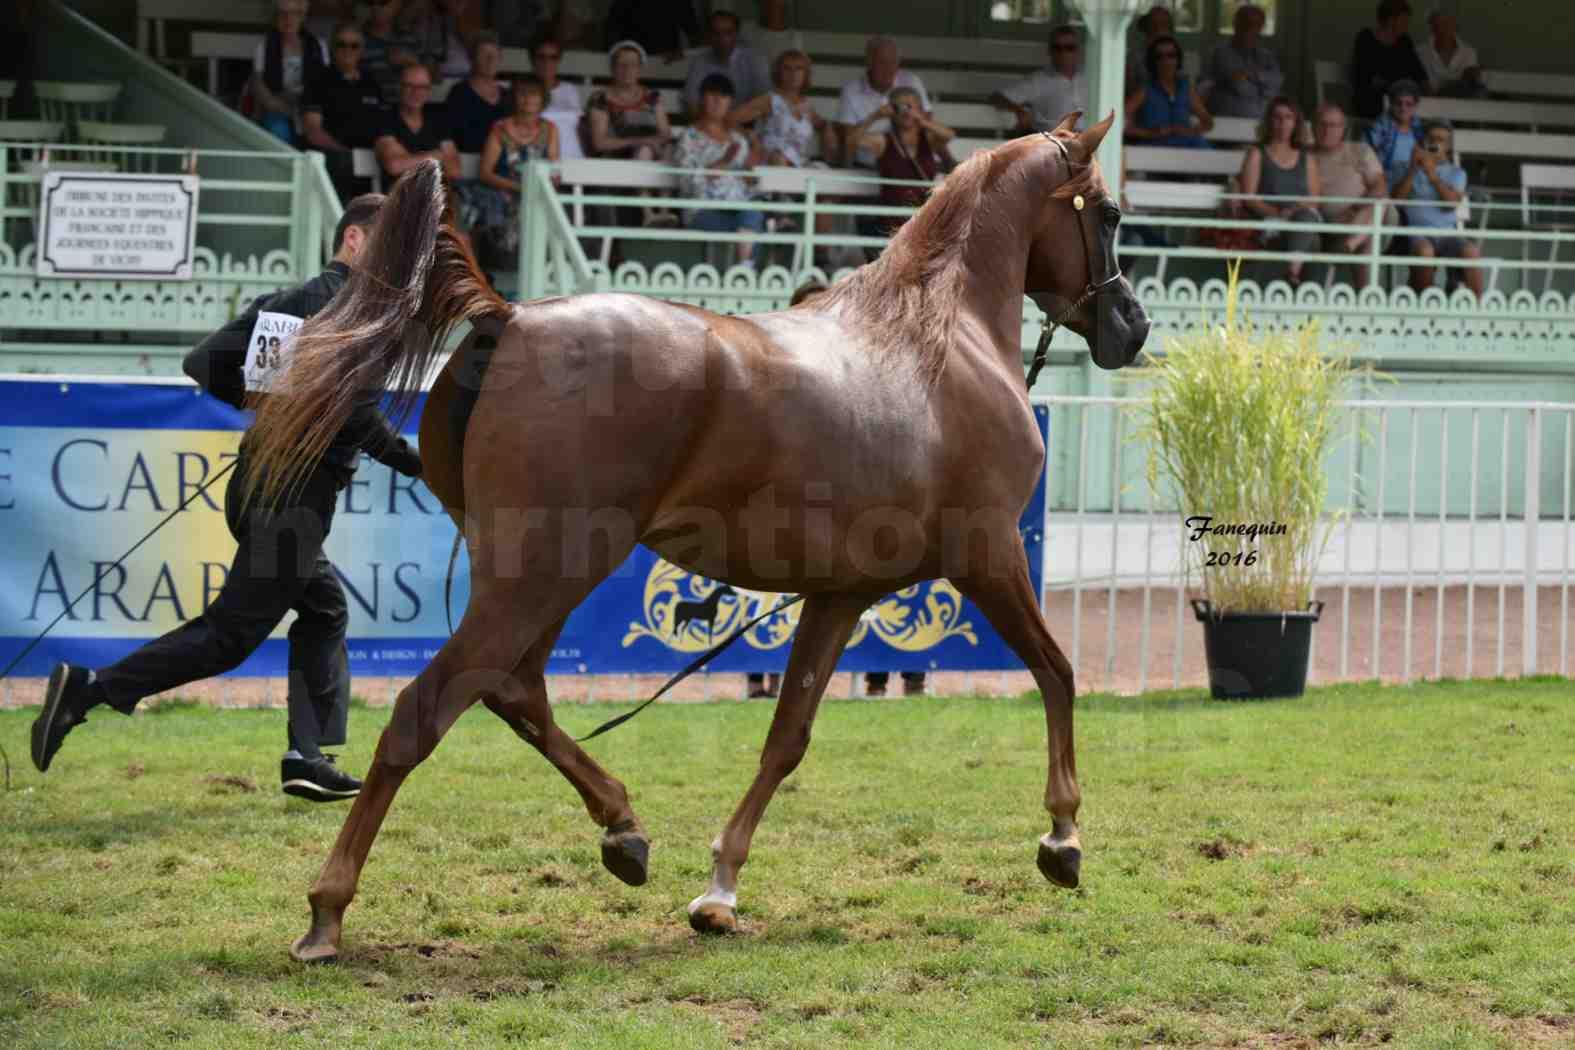 International Arabian Horse Show B de VICHY 2016 - PEARL DE DJOON - Notre Sélection - 35